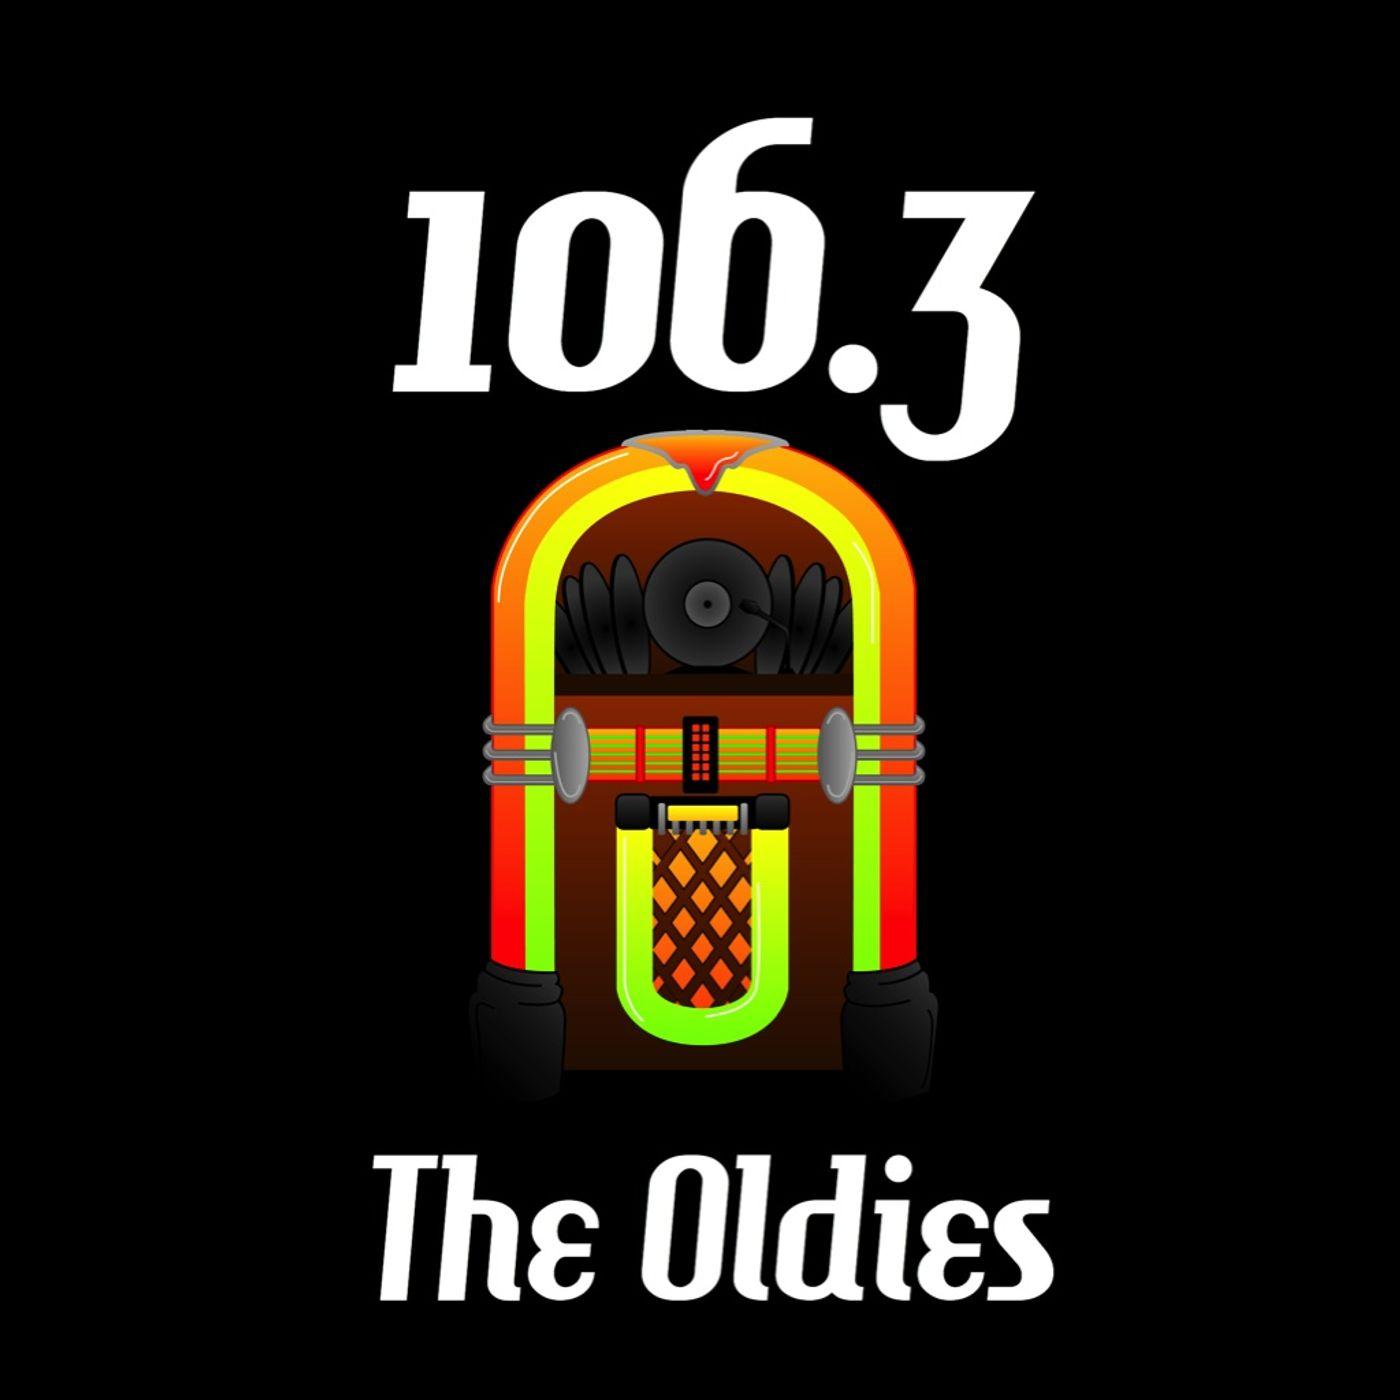 106.3 The Oldies